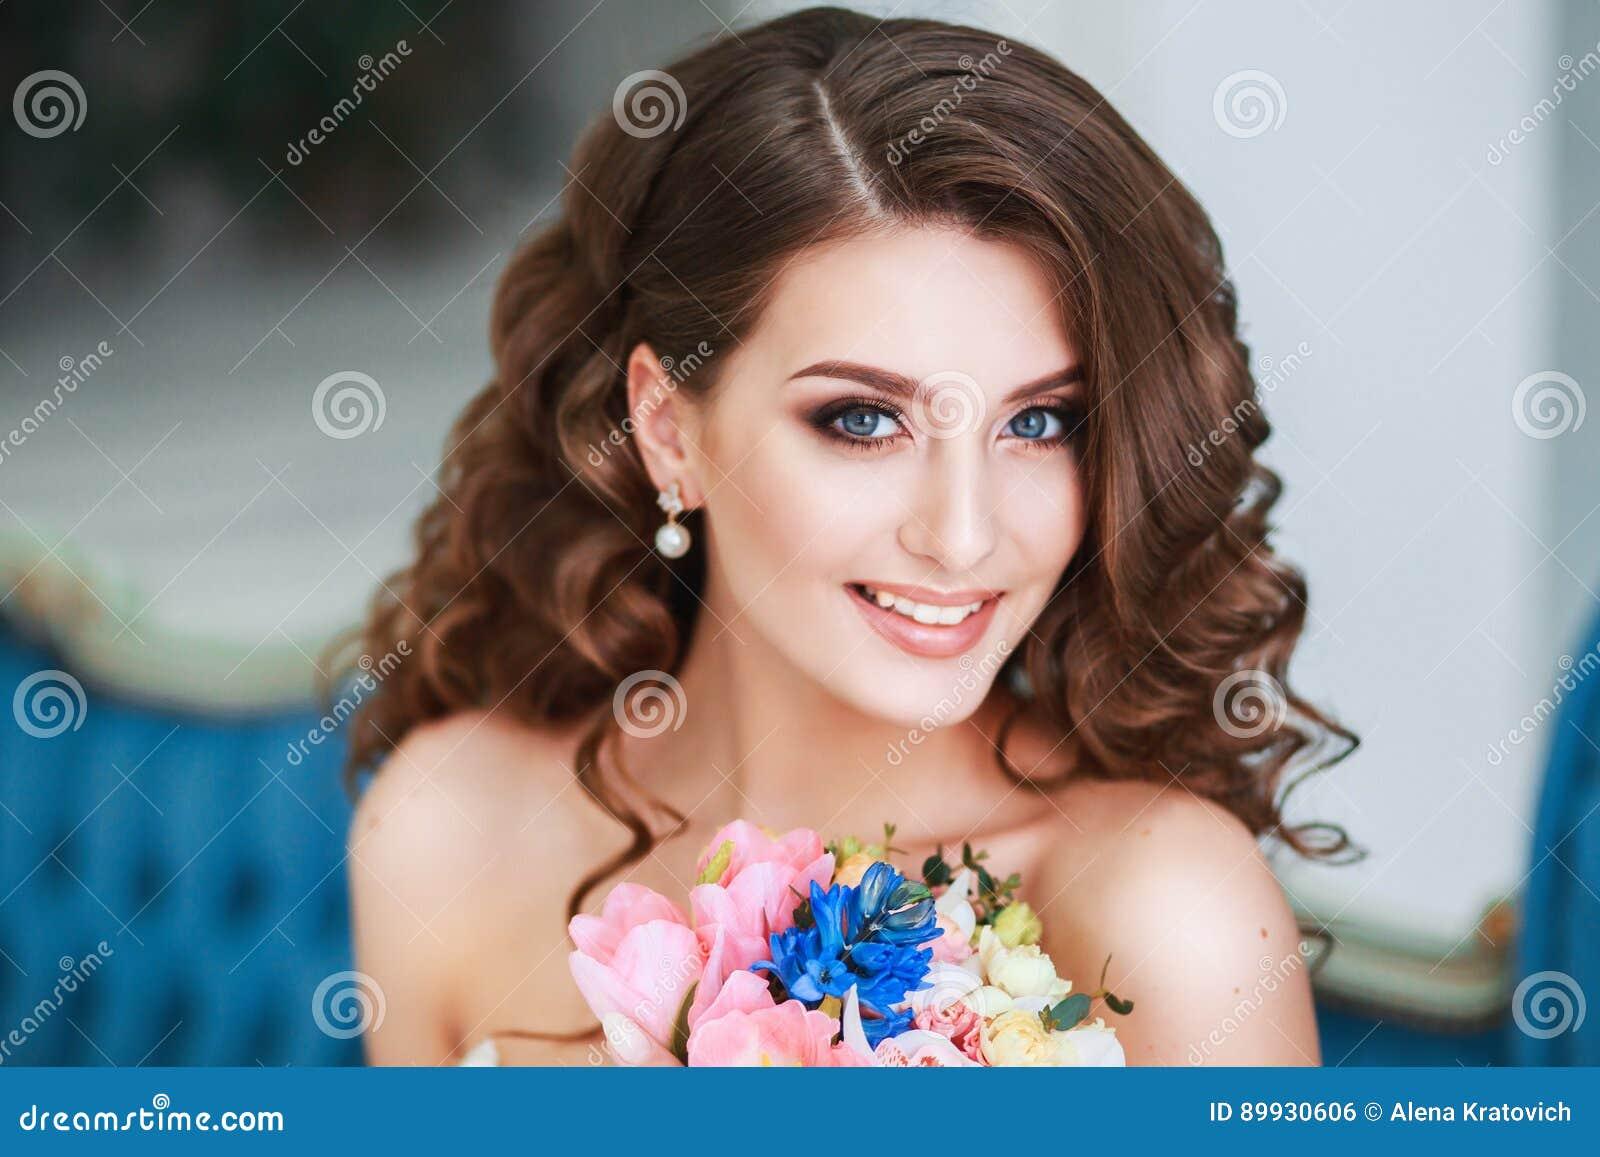 21e99b1fa5b Όμορφη νέα νύφη με το γάμο Makeup και Hairstyle εσωτερικός Πορτρέτο ...